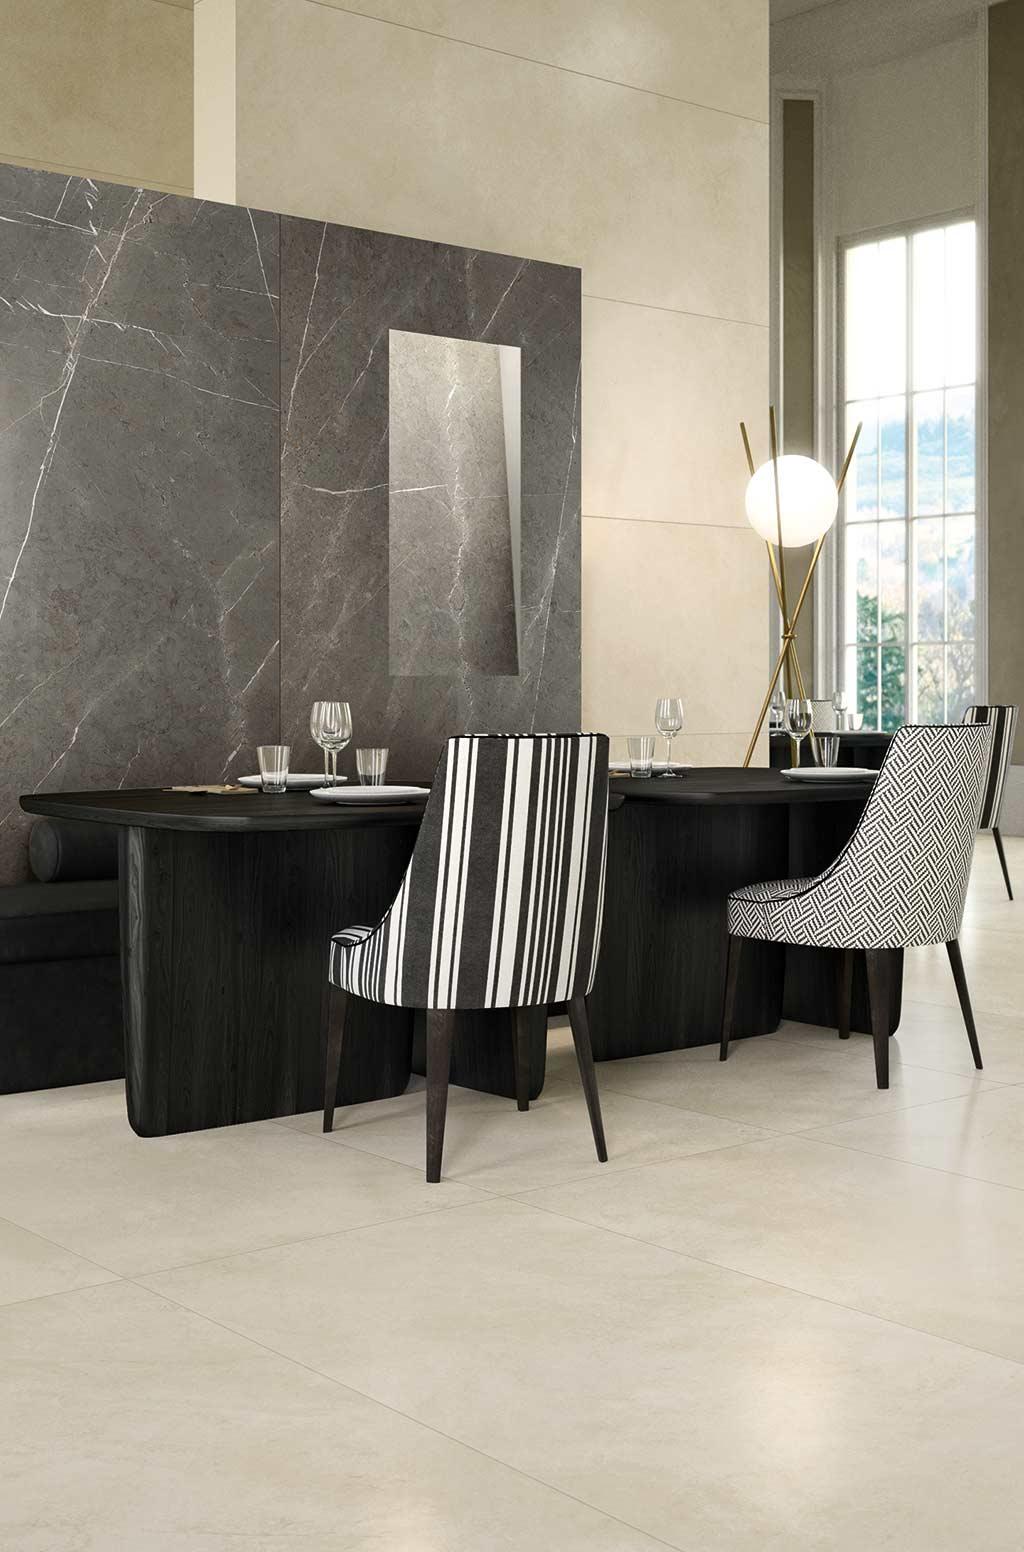 Casa-dolce-casa-stones-&-more-2.0-portfolio-2